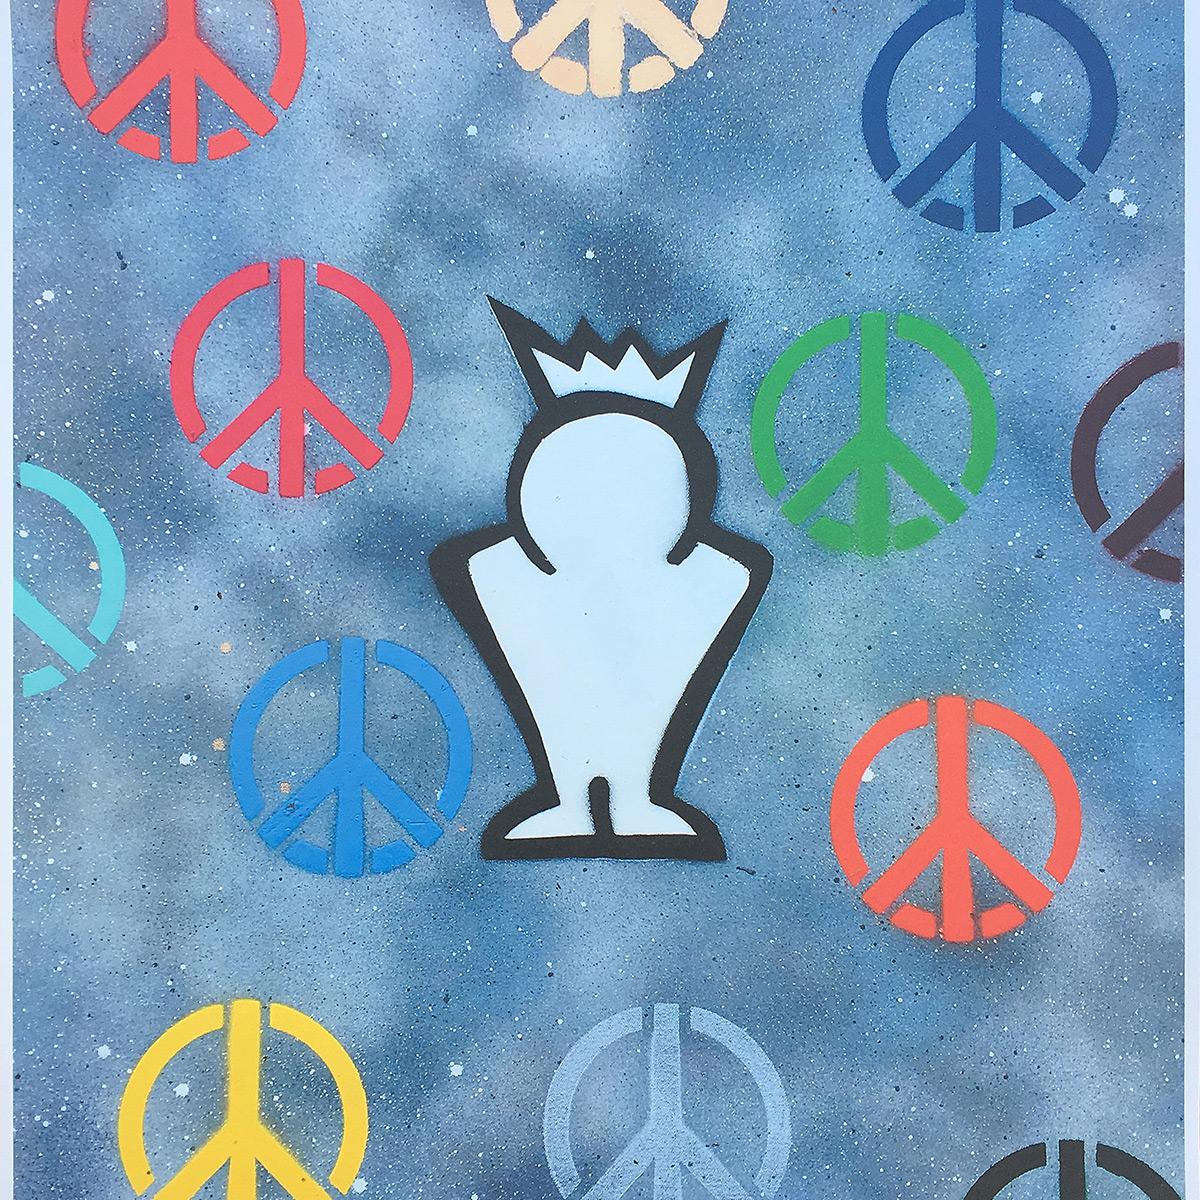 2016 - Peace - Edition 50